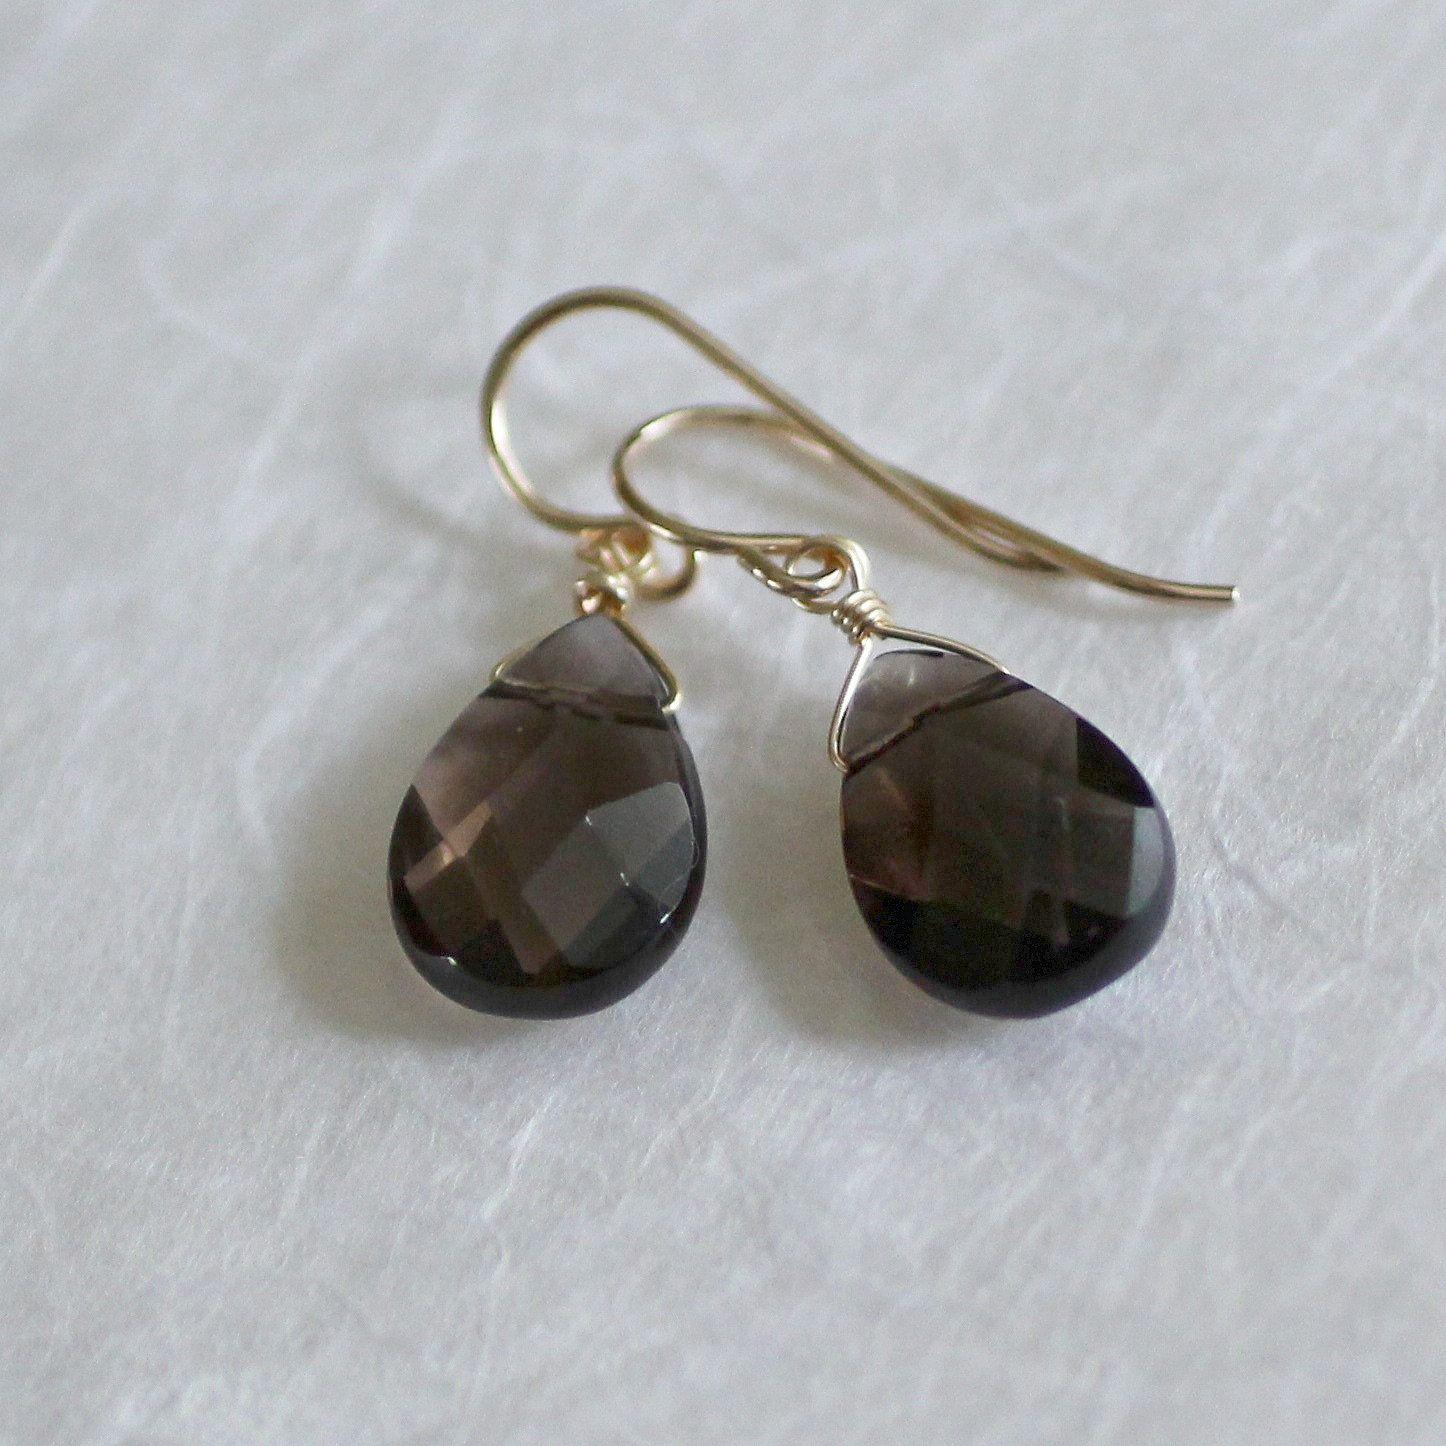 Smoky Quartz Earrings-Smoky Quartz Teardrop Earrings-Smoky Quartz Teardrops-Smoky Quartz Drop Earrings-Dangle Earrings-Brown-Gifts Under 40 #smokyquartz